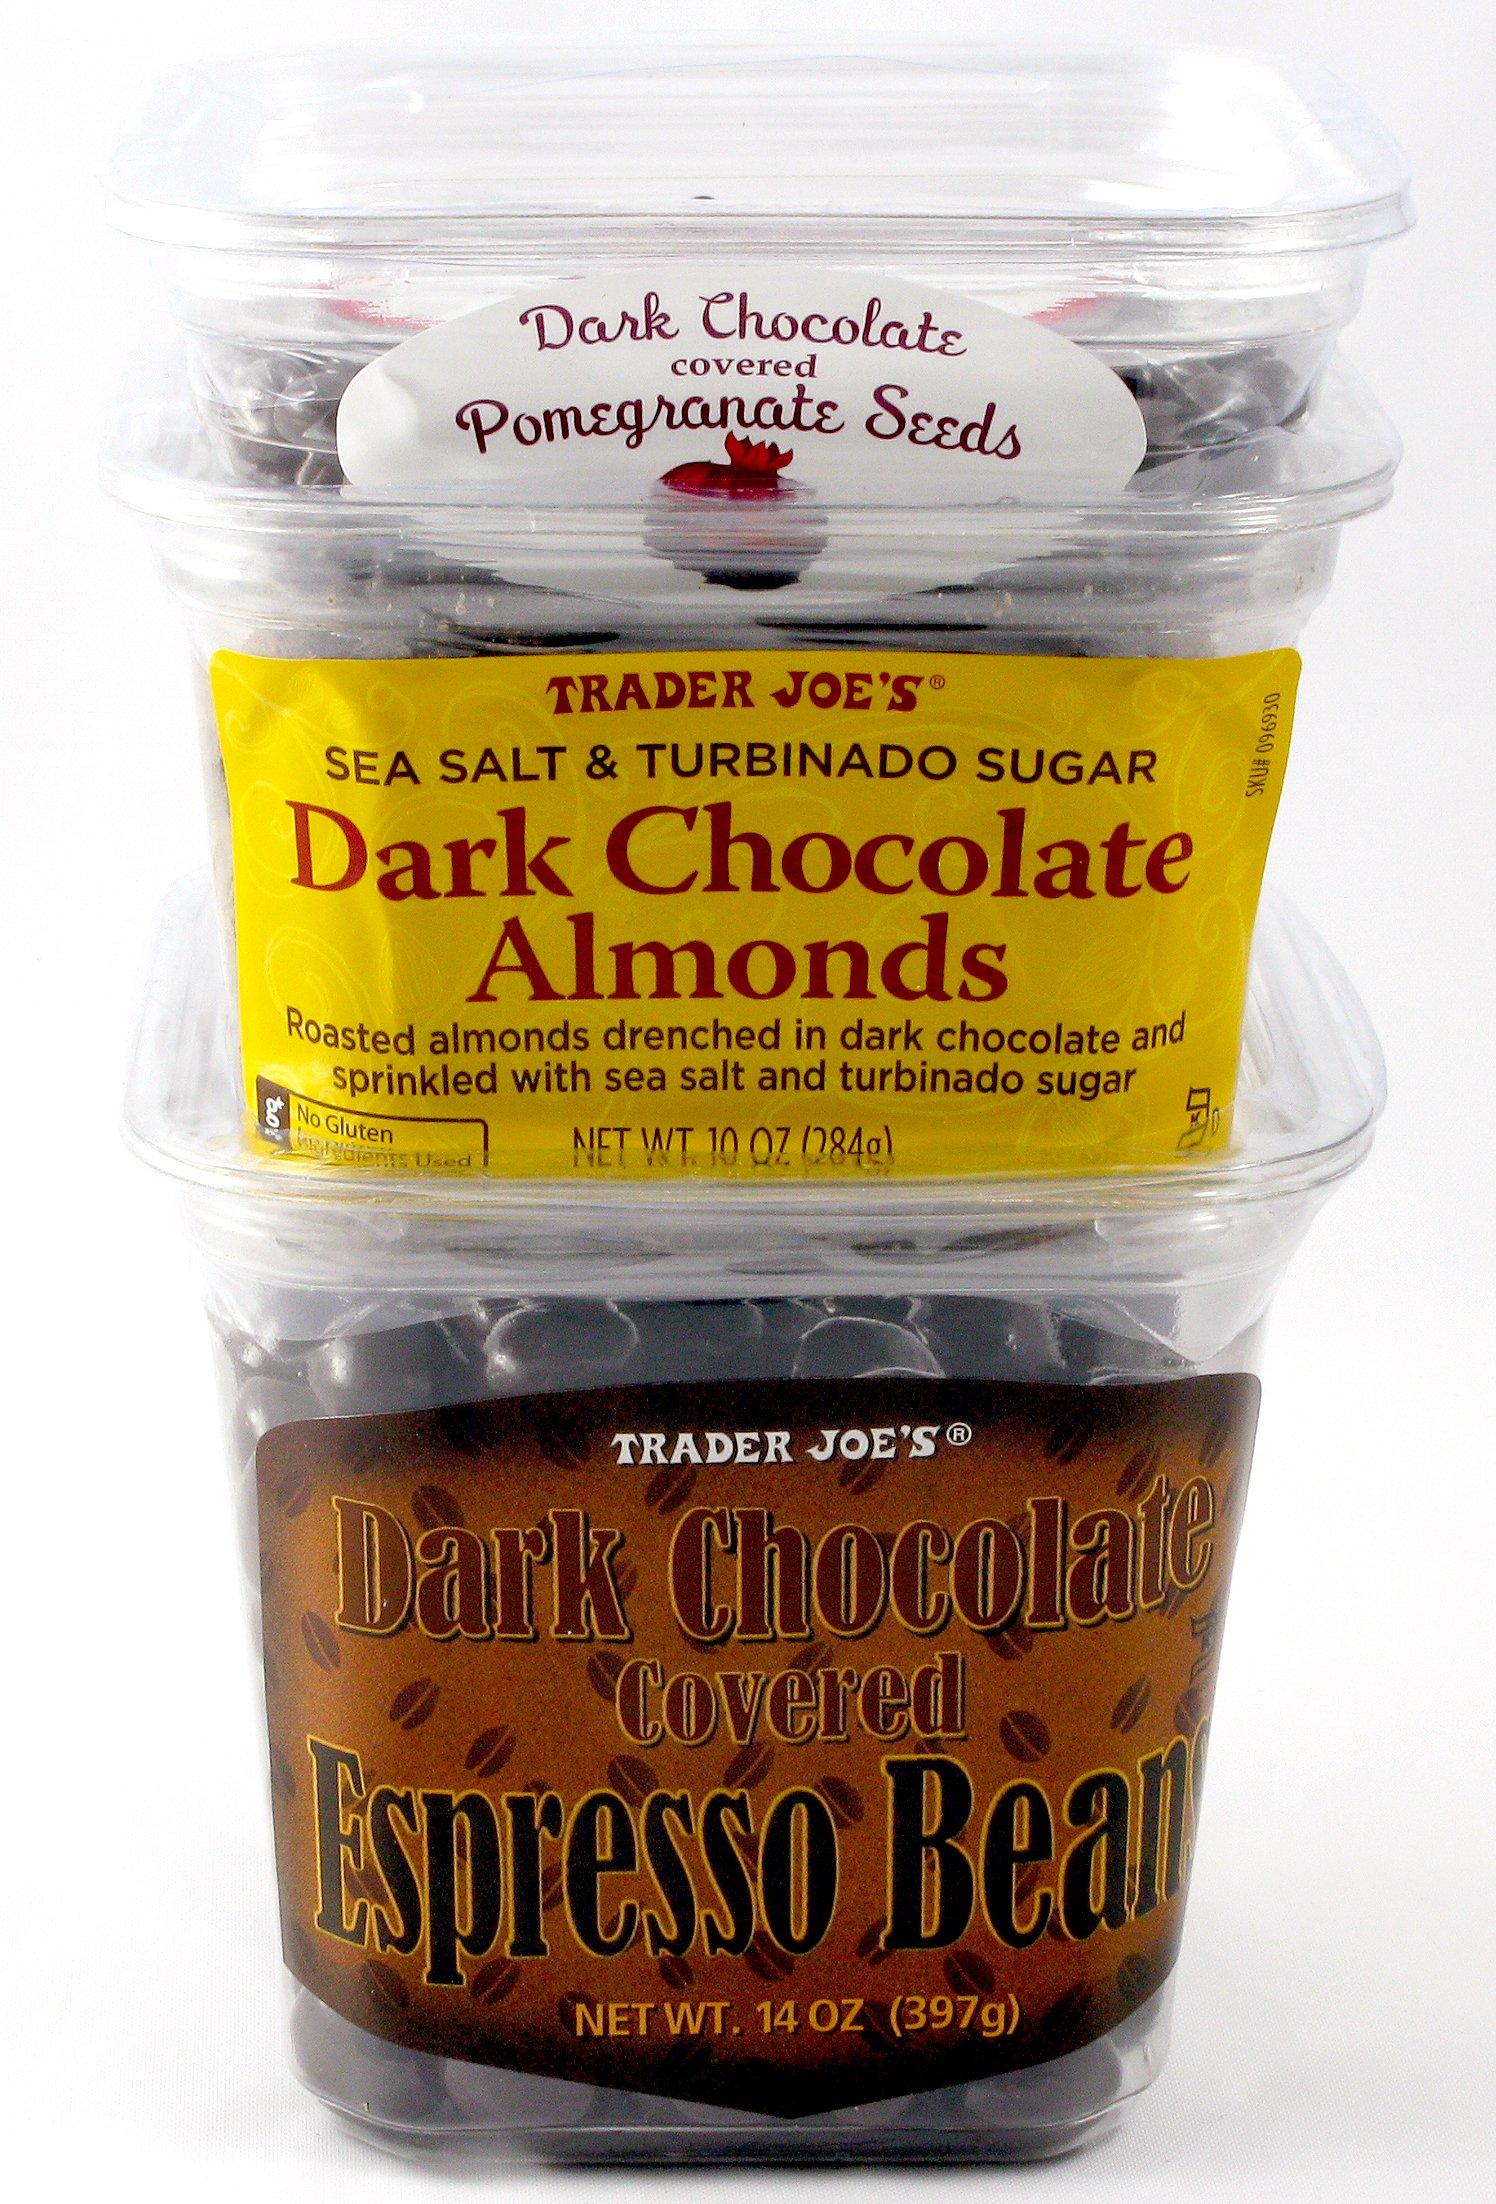 Trader Joe's Dark Chocolate Covered Espresso Beans, Dark Chocolate Covered Pomegranate Seeds, and Sea Salt and Turbinado Sugar Dark Chocolate Almonds - 3 Items Total